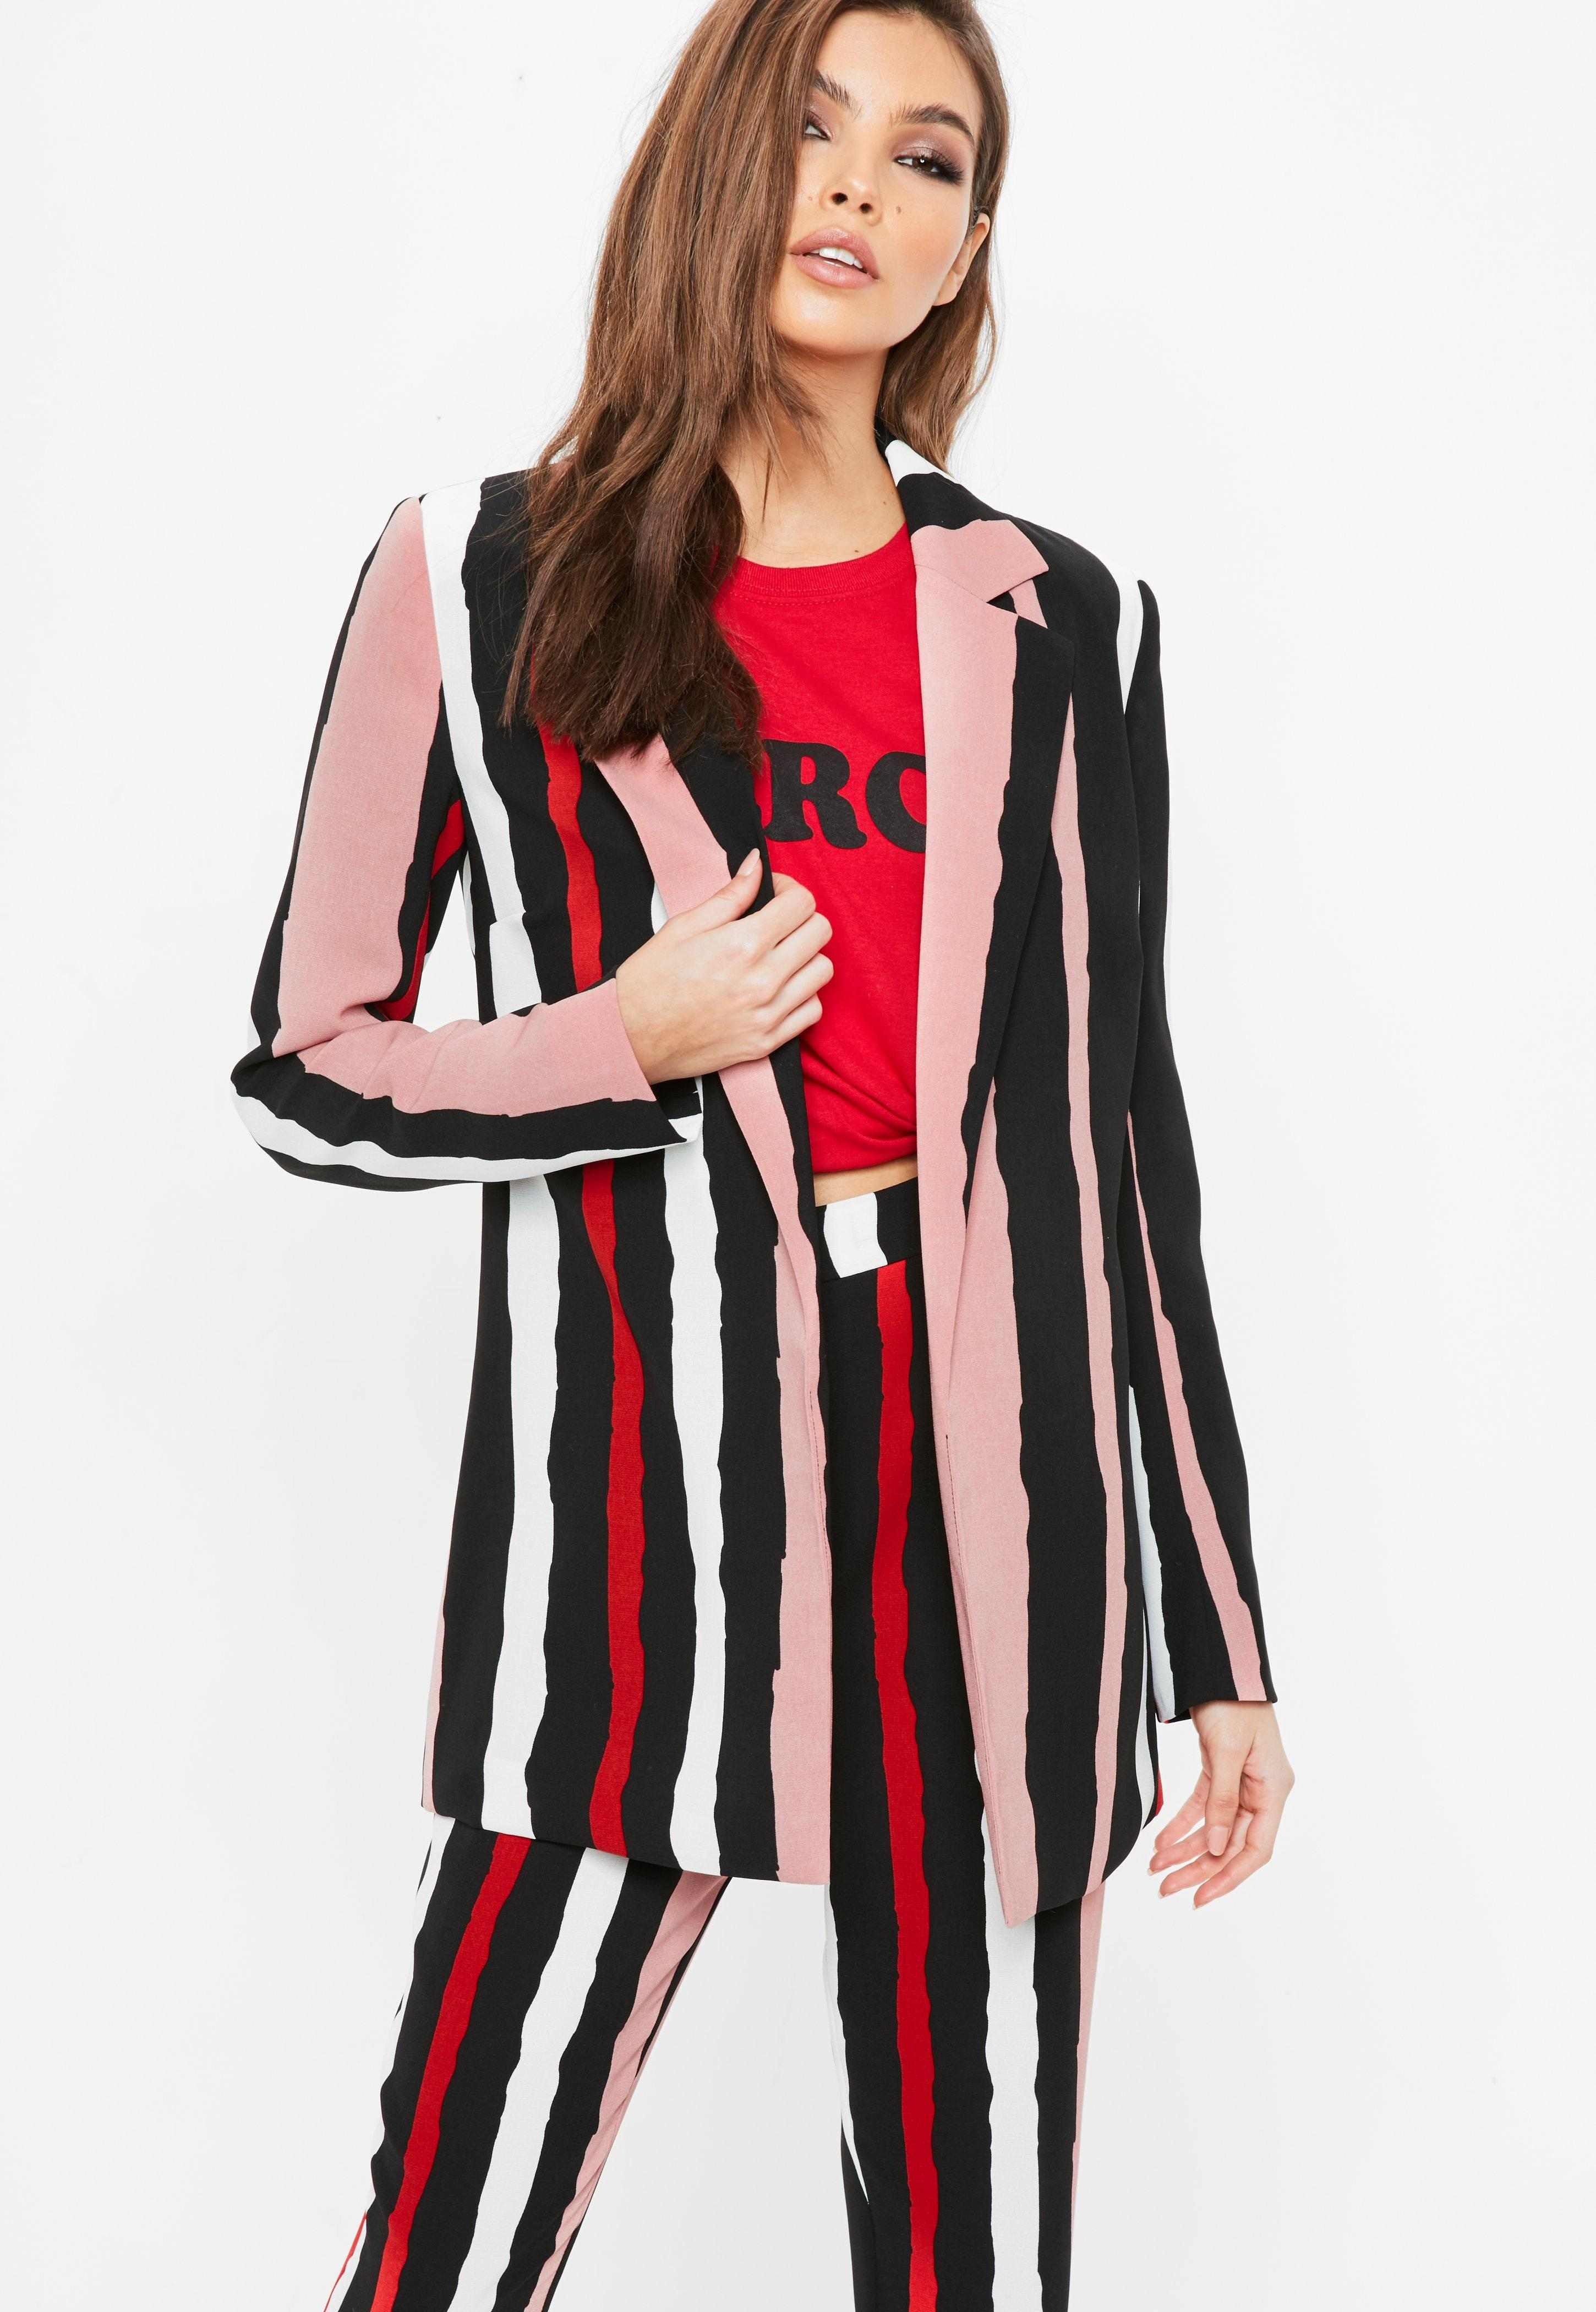 Veste blazer femme rose fushia